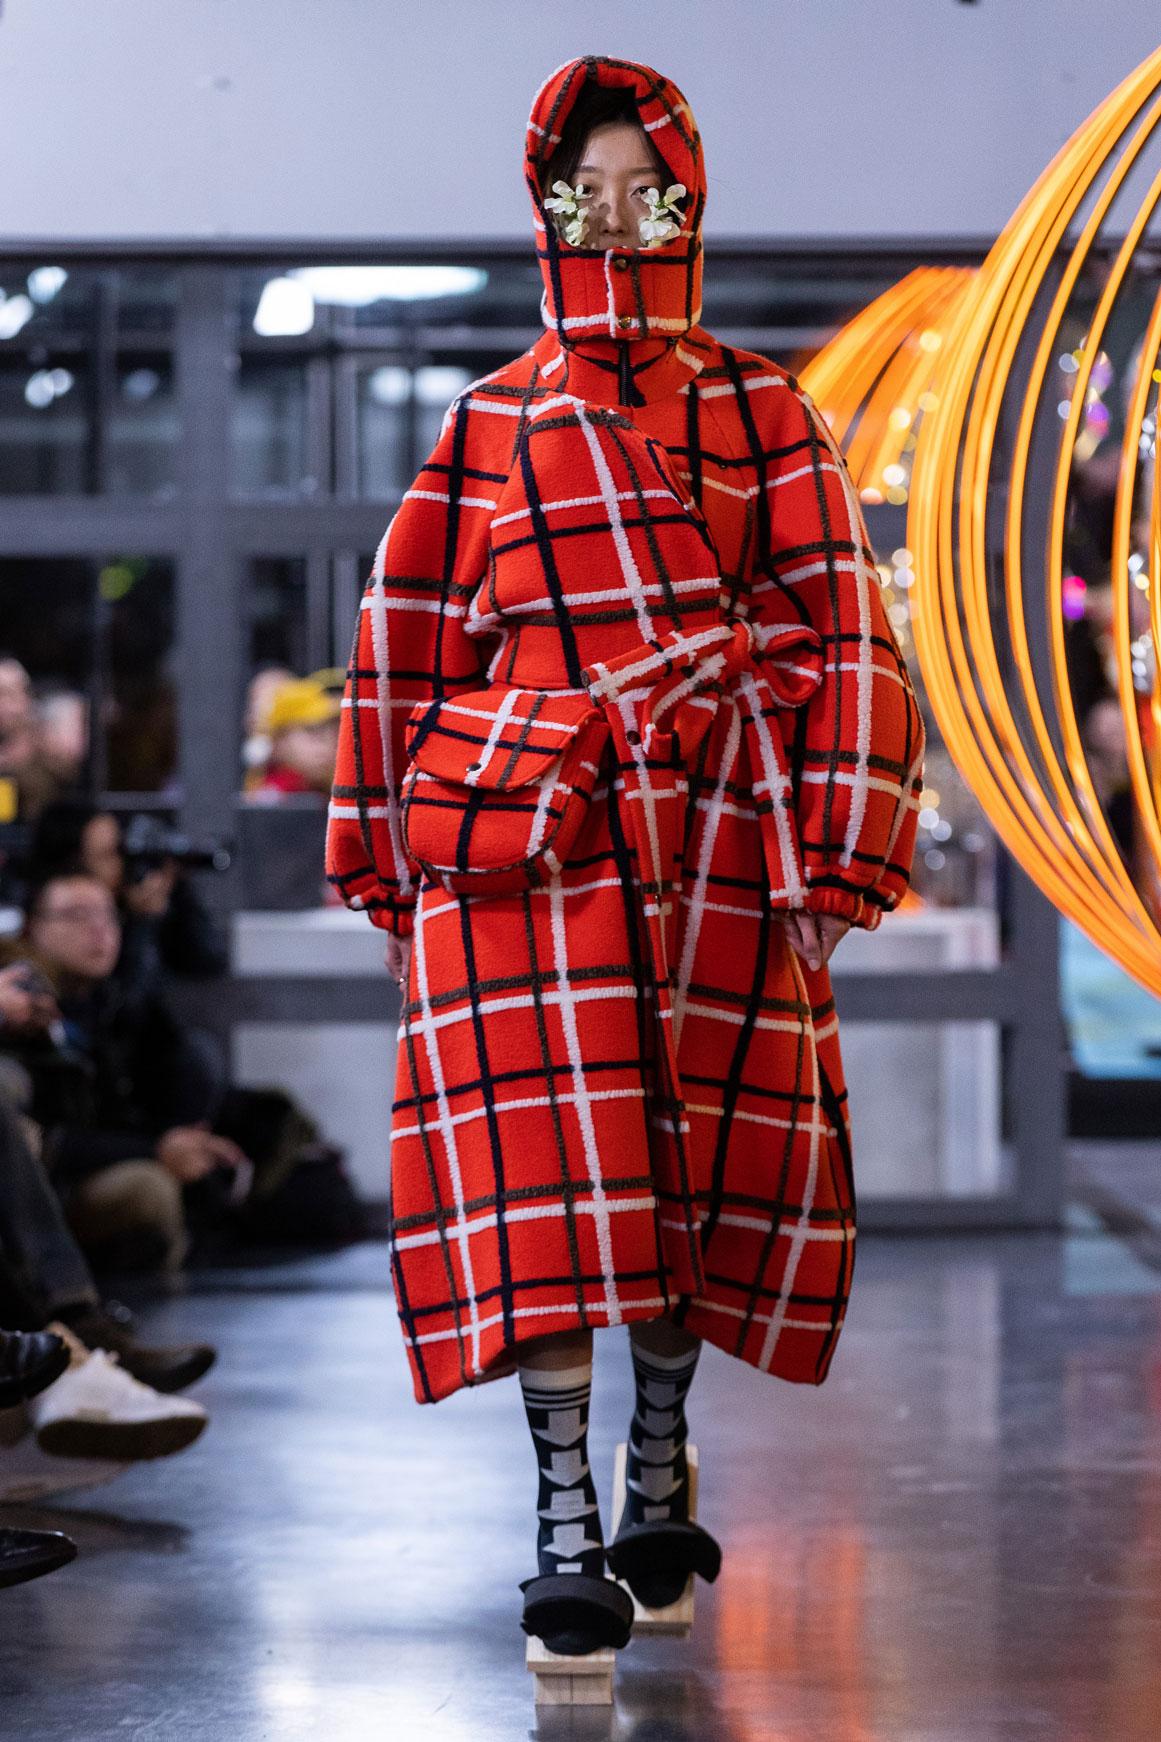 Henrik-Vibskov-THE-RADISH-ARM-CHARM-fashionweek-copenhagen-2019-le-mile-magazine-1.jpg